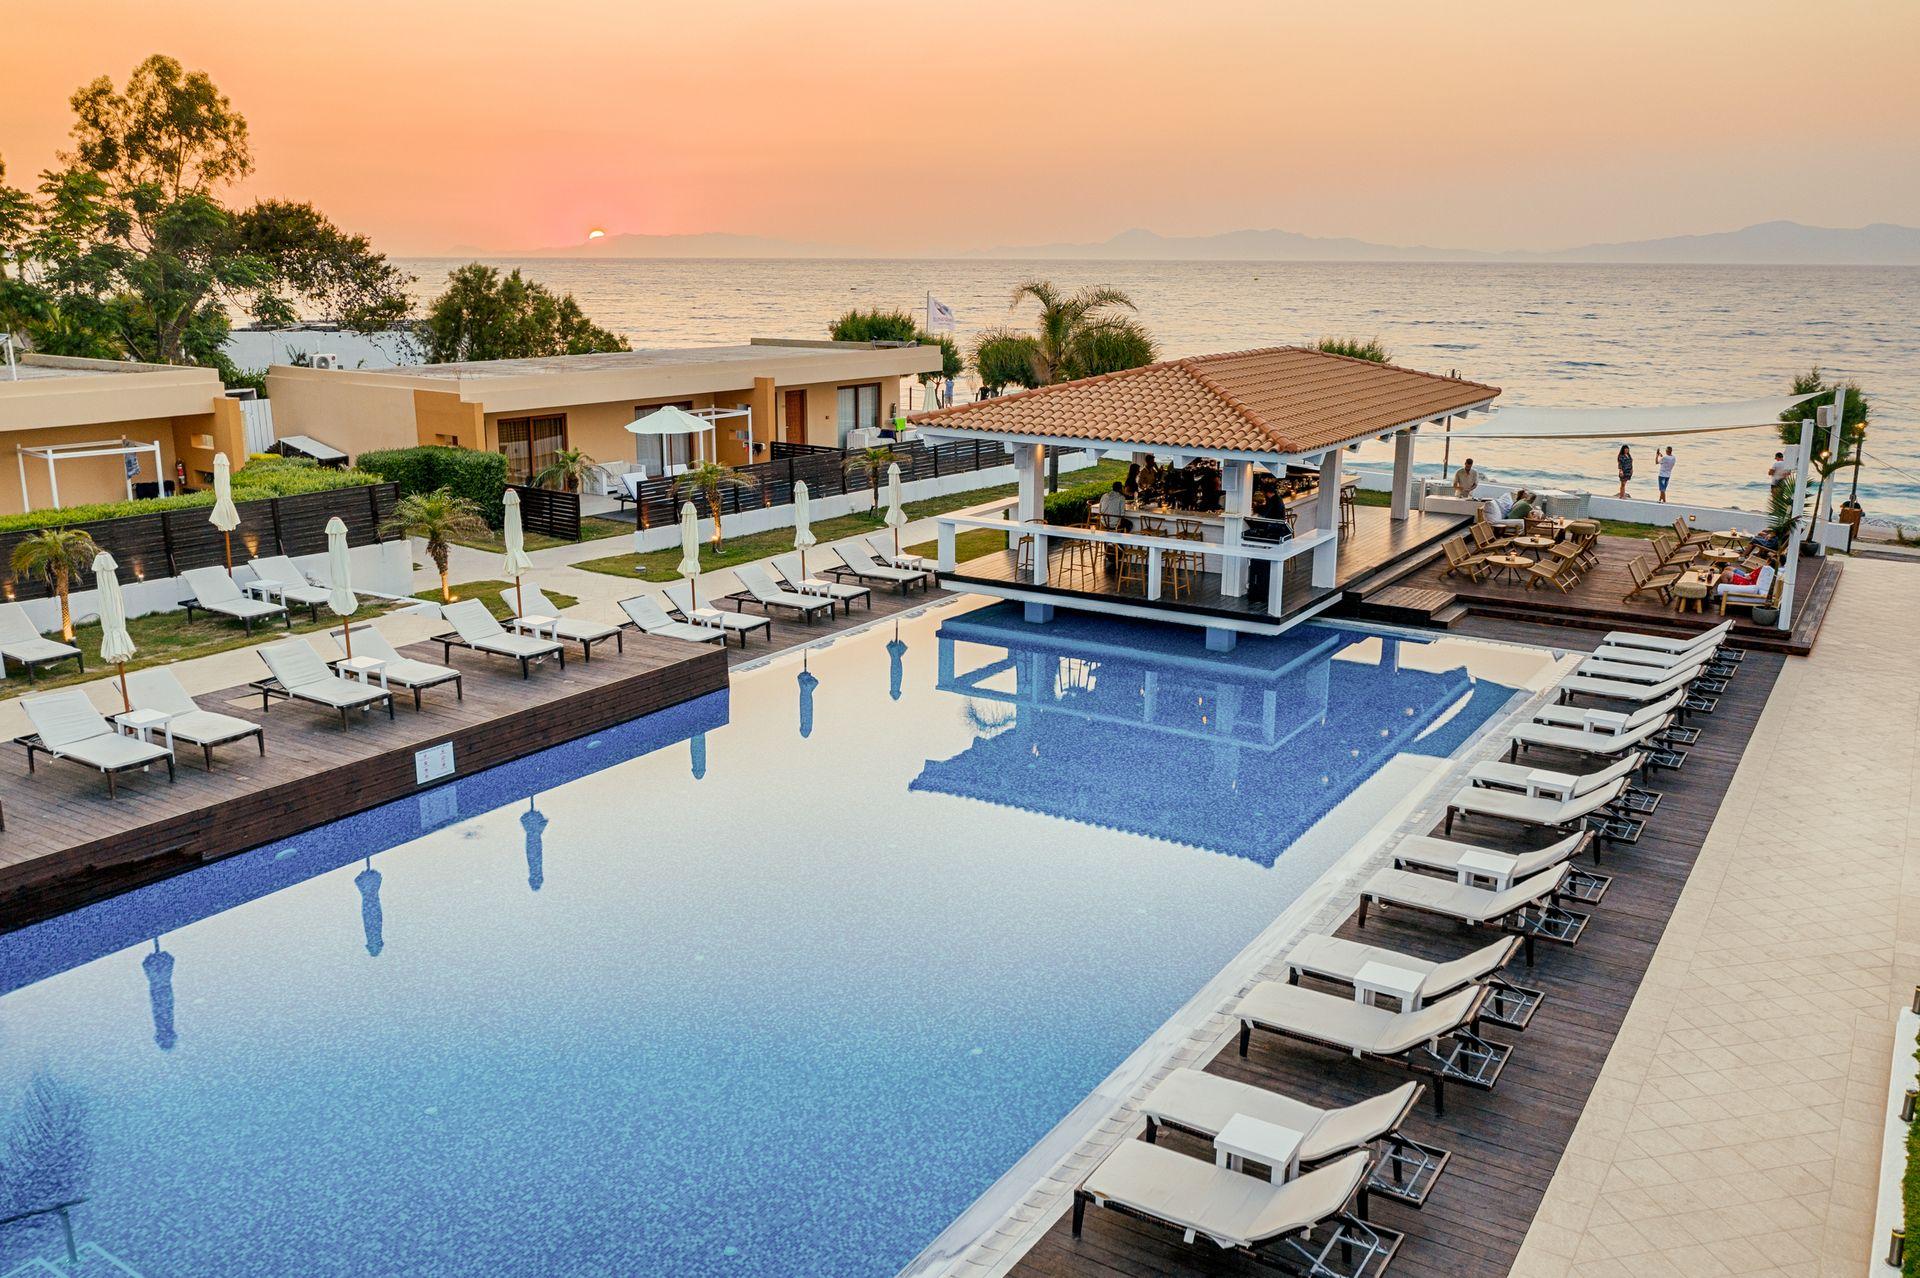 5* Villa Di Mare Seaside Suites - Ροδος ✦ 2 Ημερες (1 Διανυκτερευση) ✦ 2 ατομα ✦ Χωρις Πρωινο ✦ 07/07/2020 εως 31/07/2020 ✦ Free WiFi!